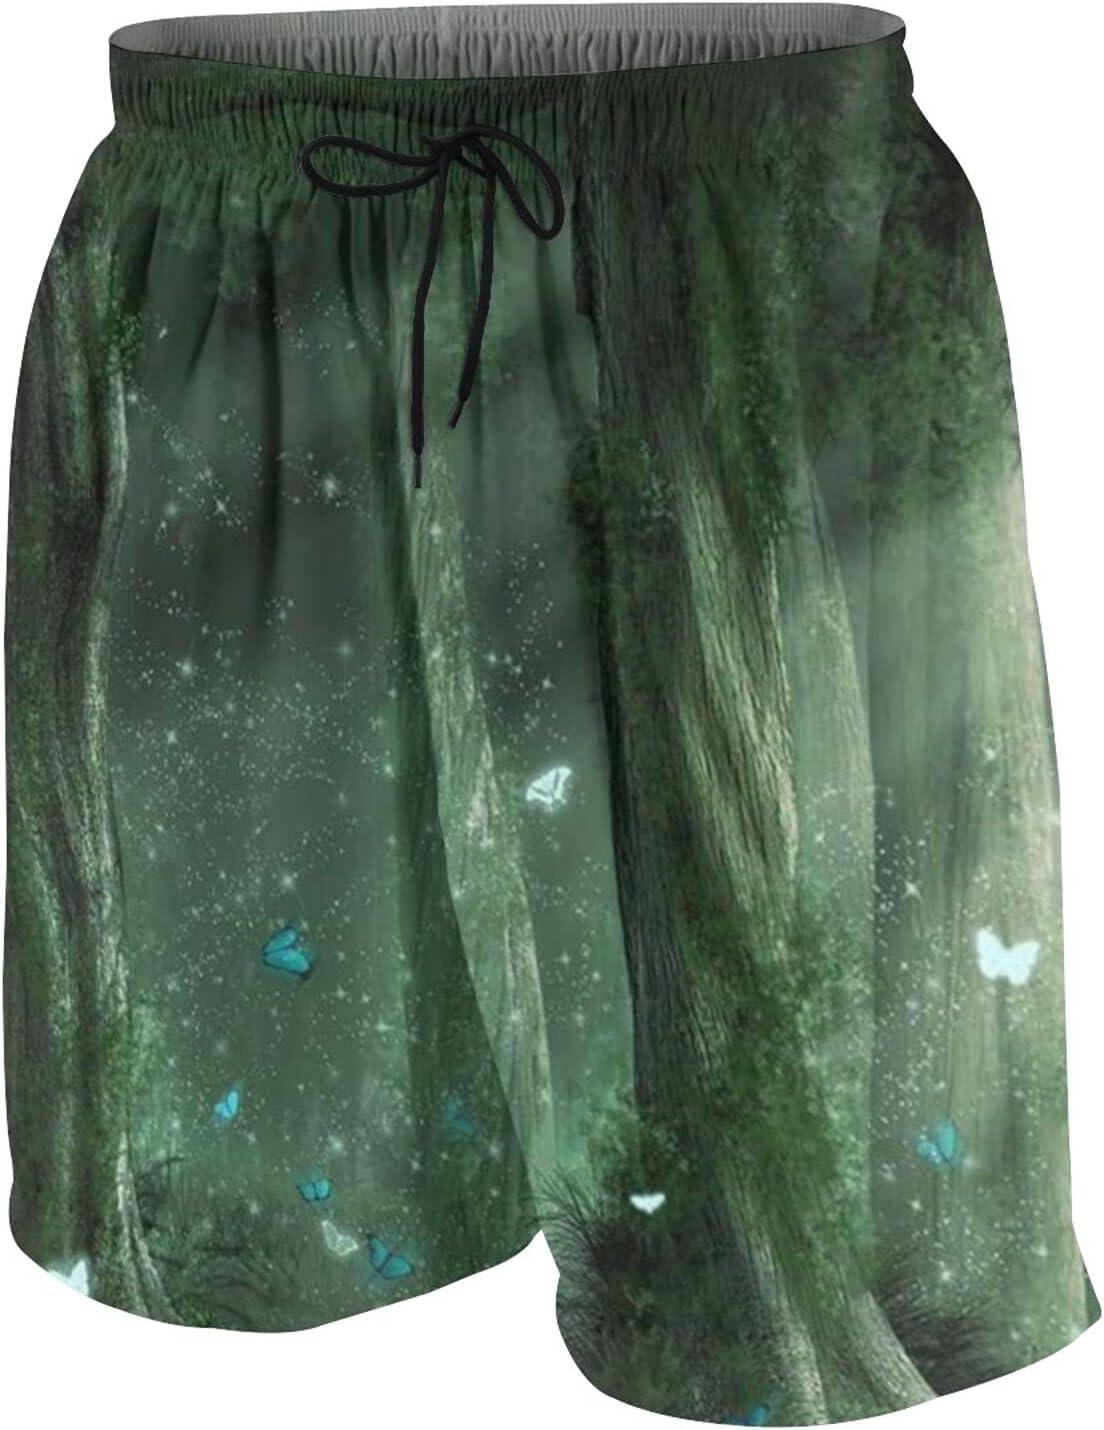 BUERYUZ Popular product Youth Beach Popular Pants Fantasy Running Green Forest Sho Shiny